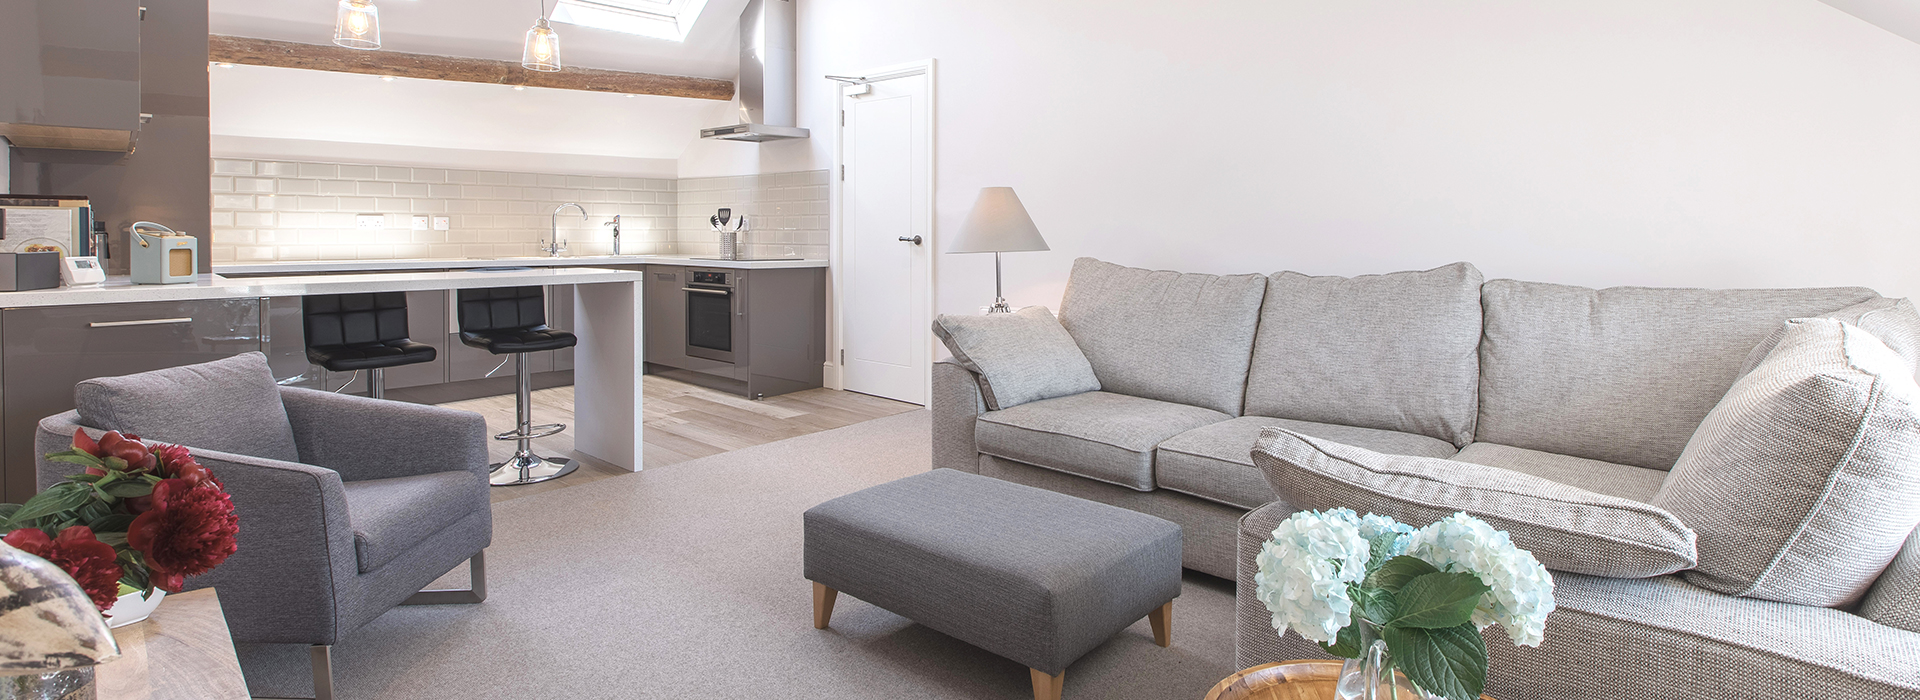 Grey apartment with white door